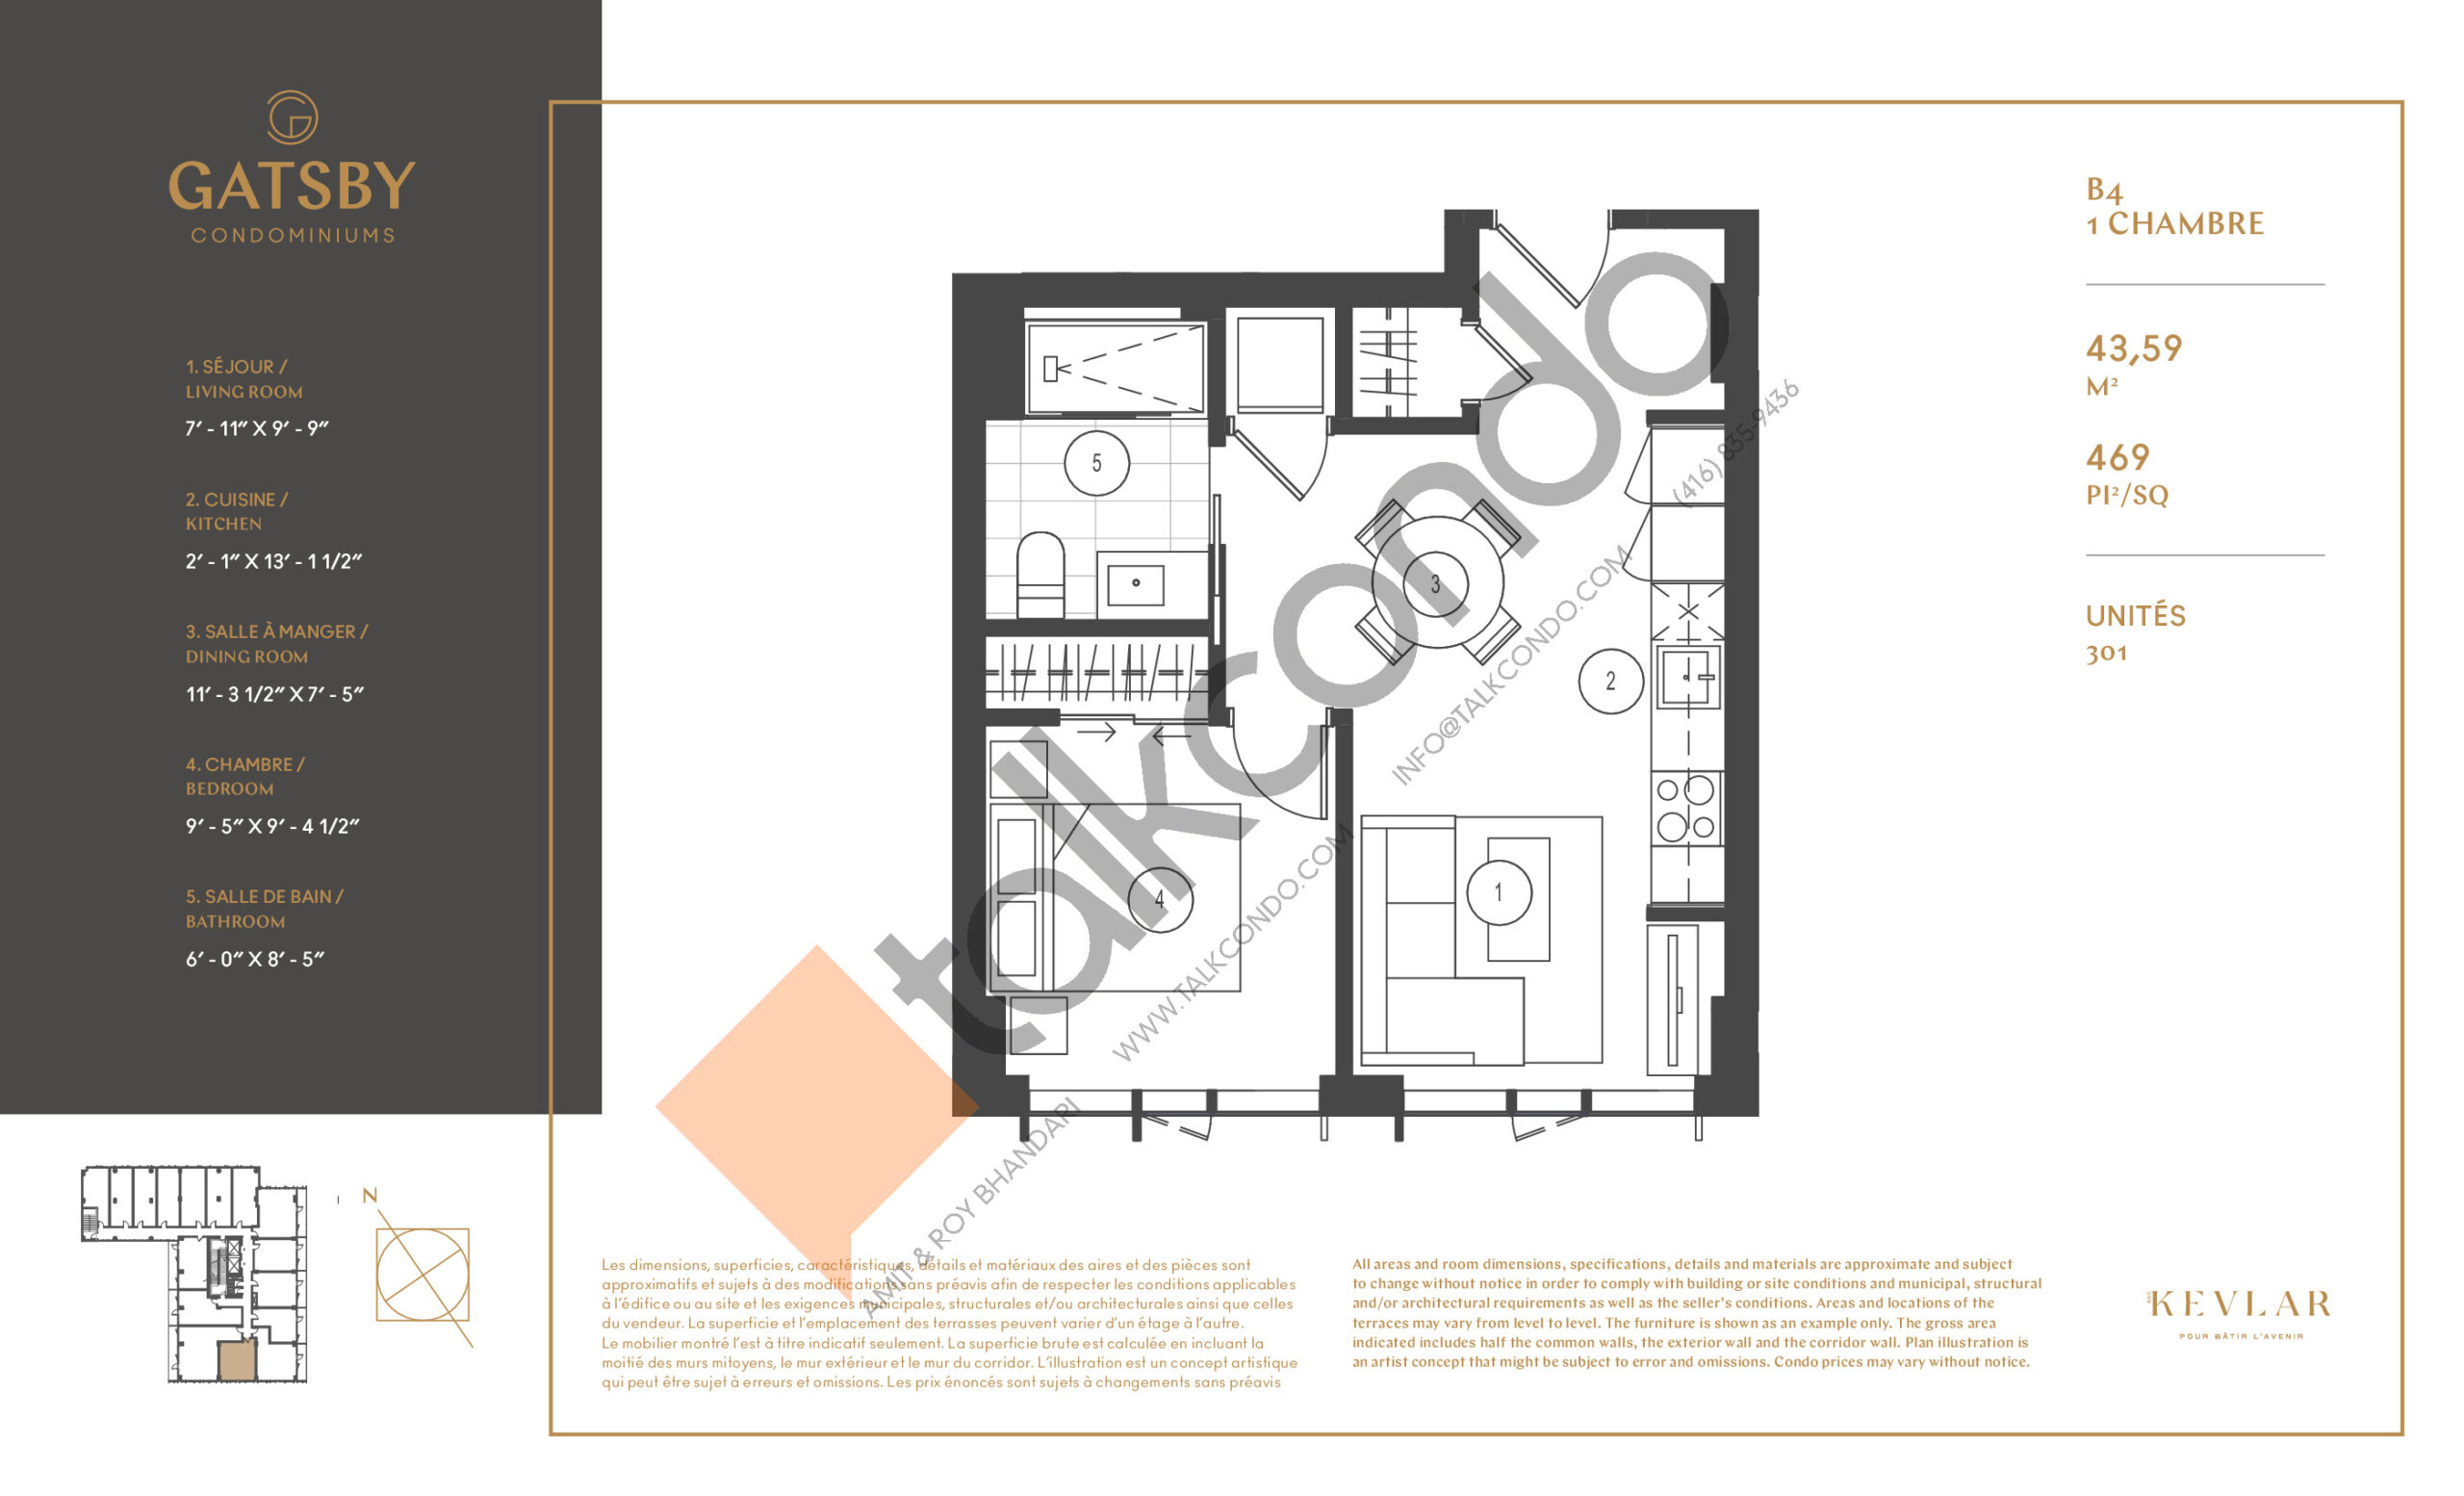 B4 Floor Plan at Gatsby Condos - 469 sq.ft